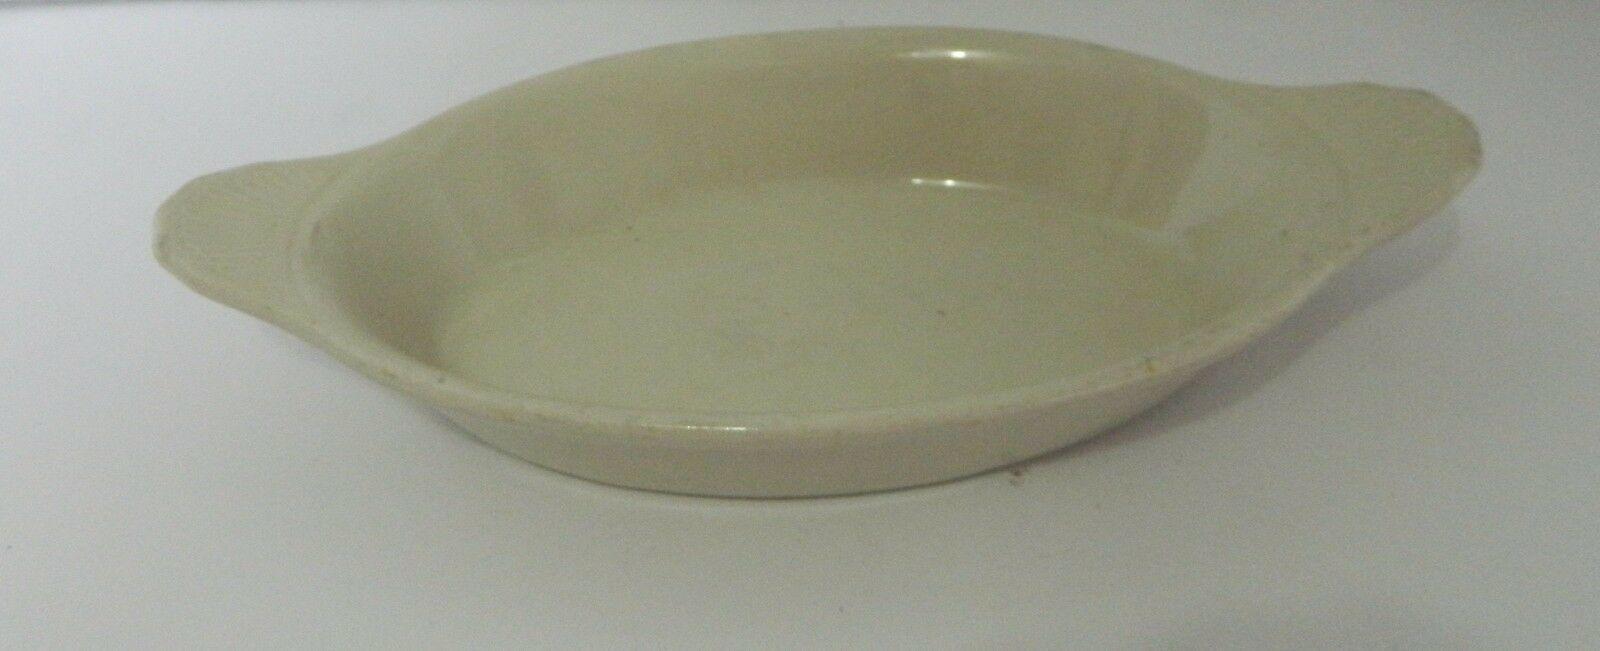 Bel-Terr Oval Au Gratin Potato Baking Dish Restaurant Ware Off White #9529